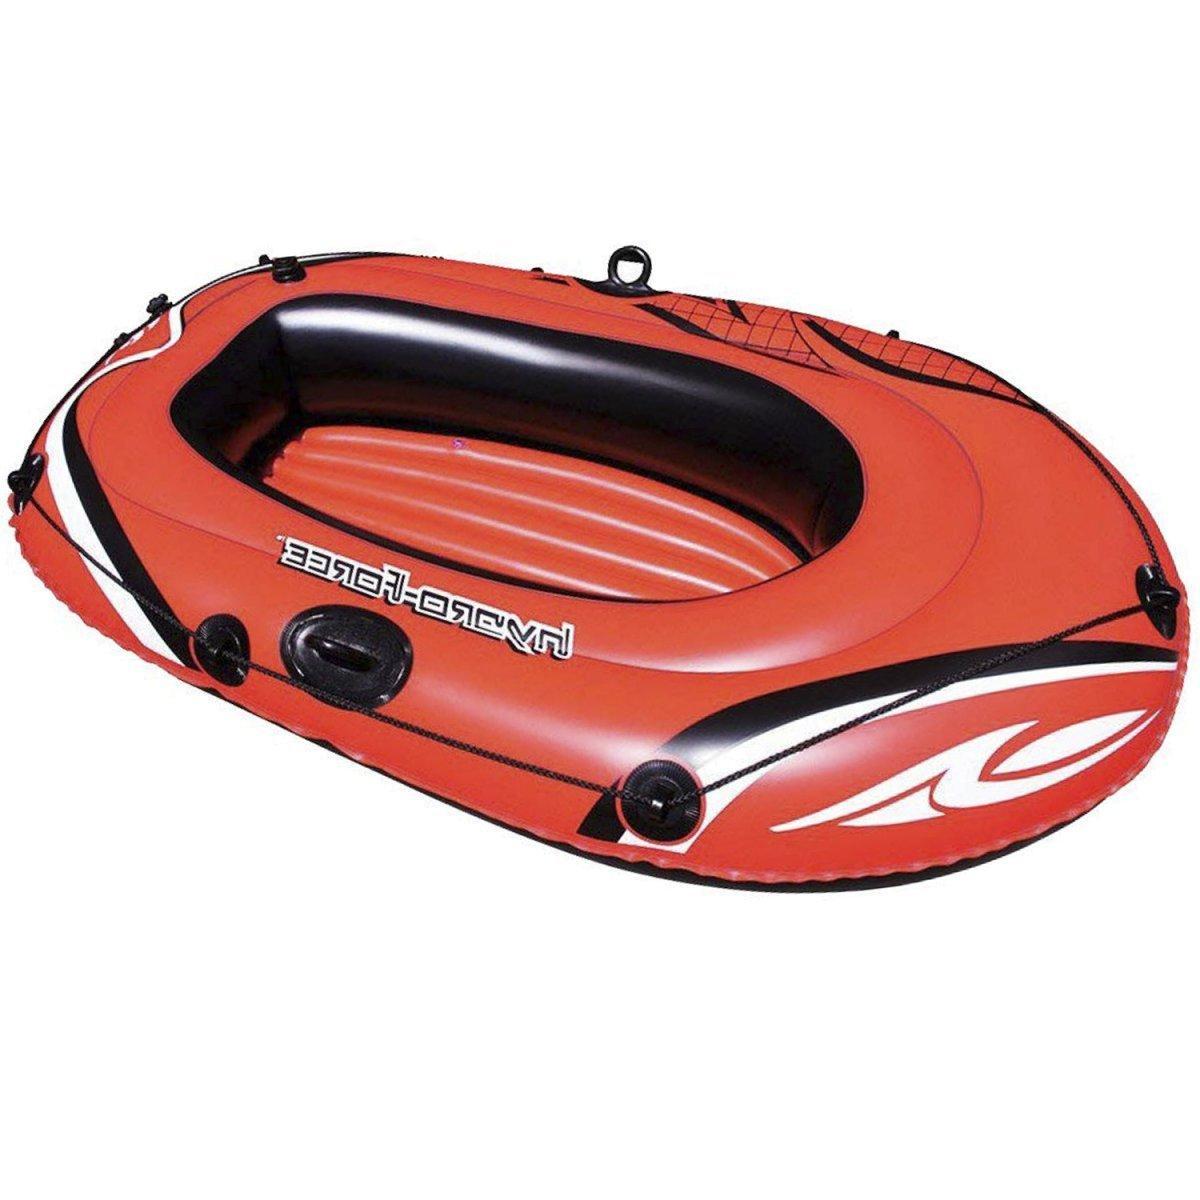 Одноместная надувная лодка Bestway 61099, Hydro Force, 155 х 97 см